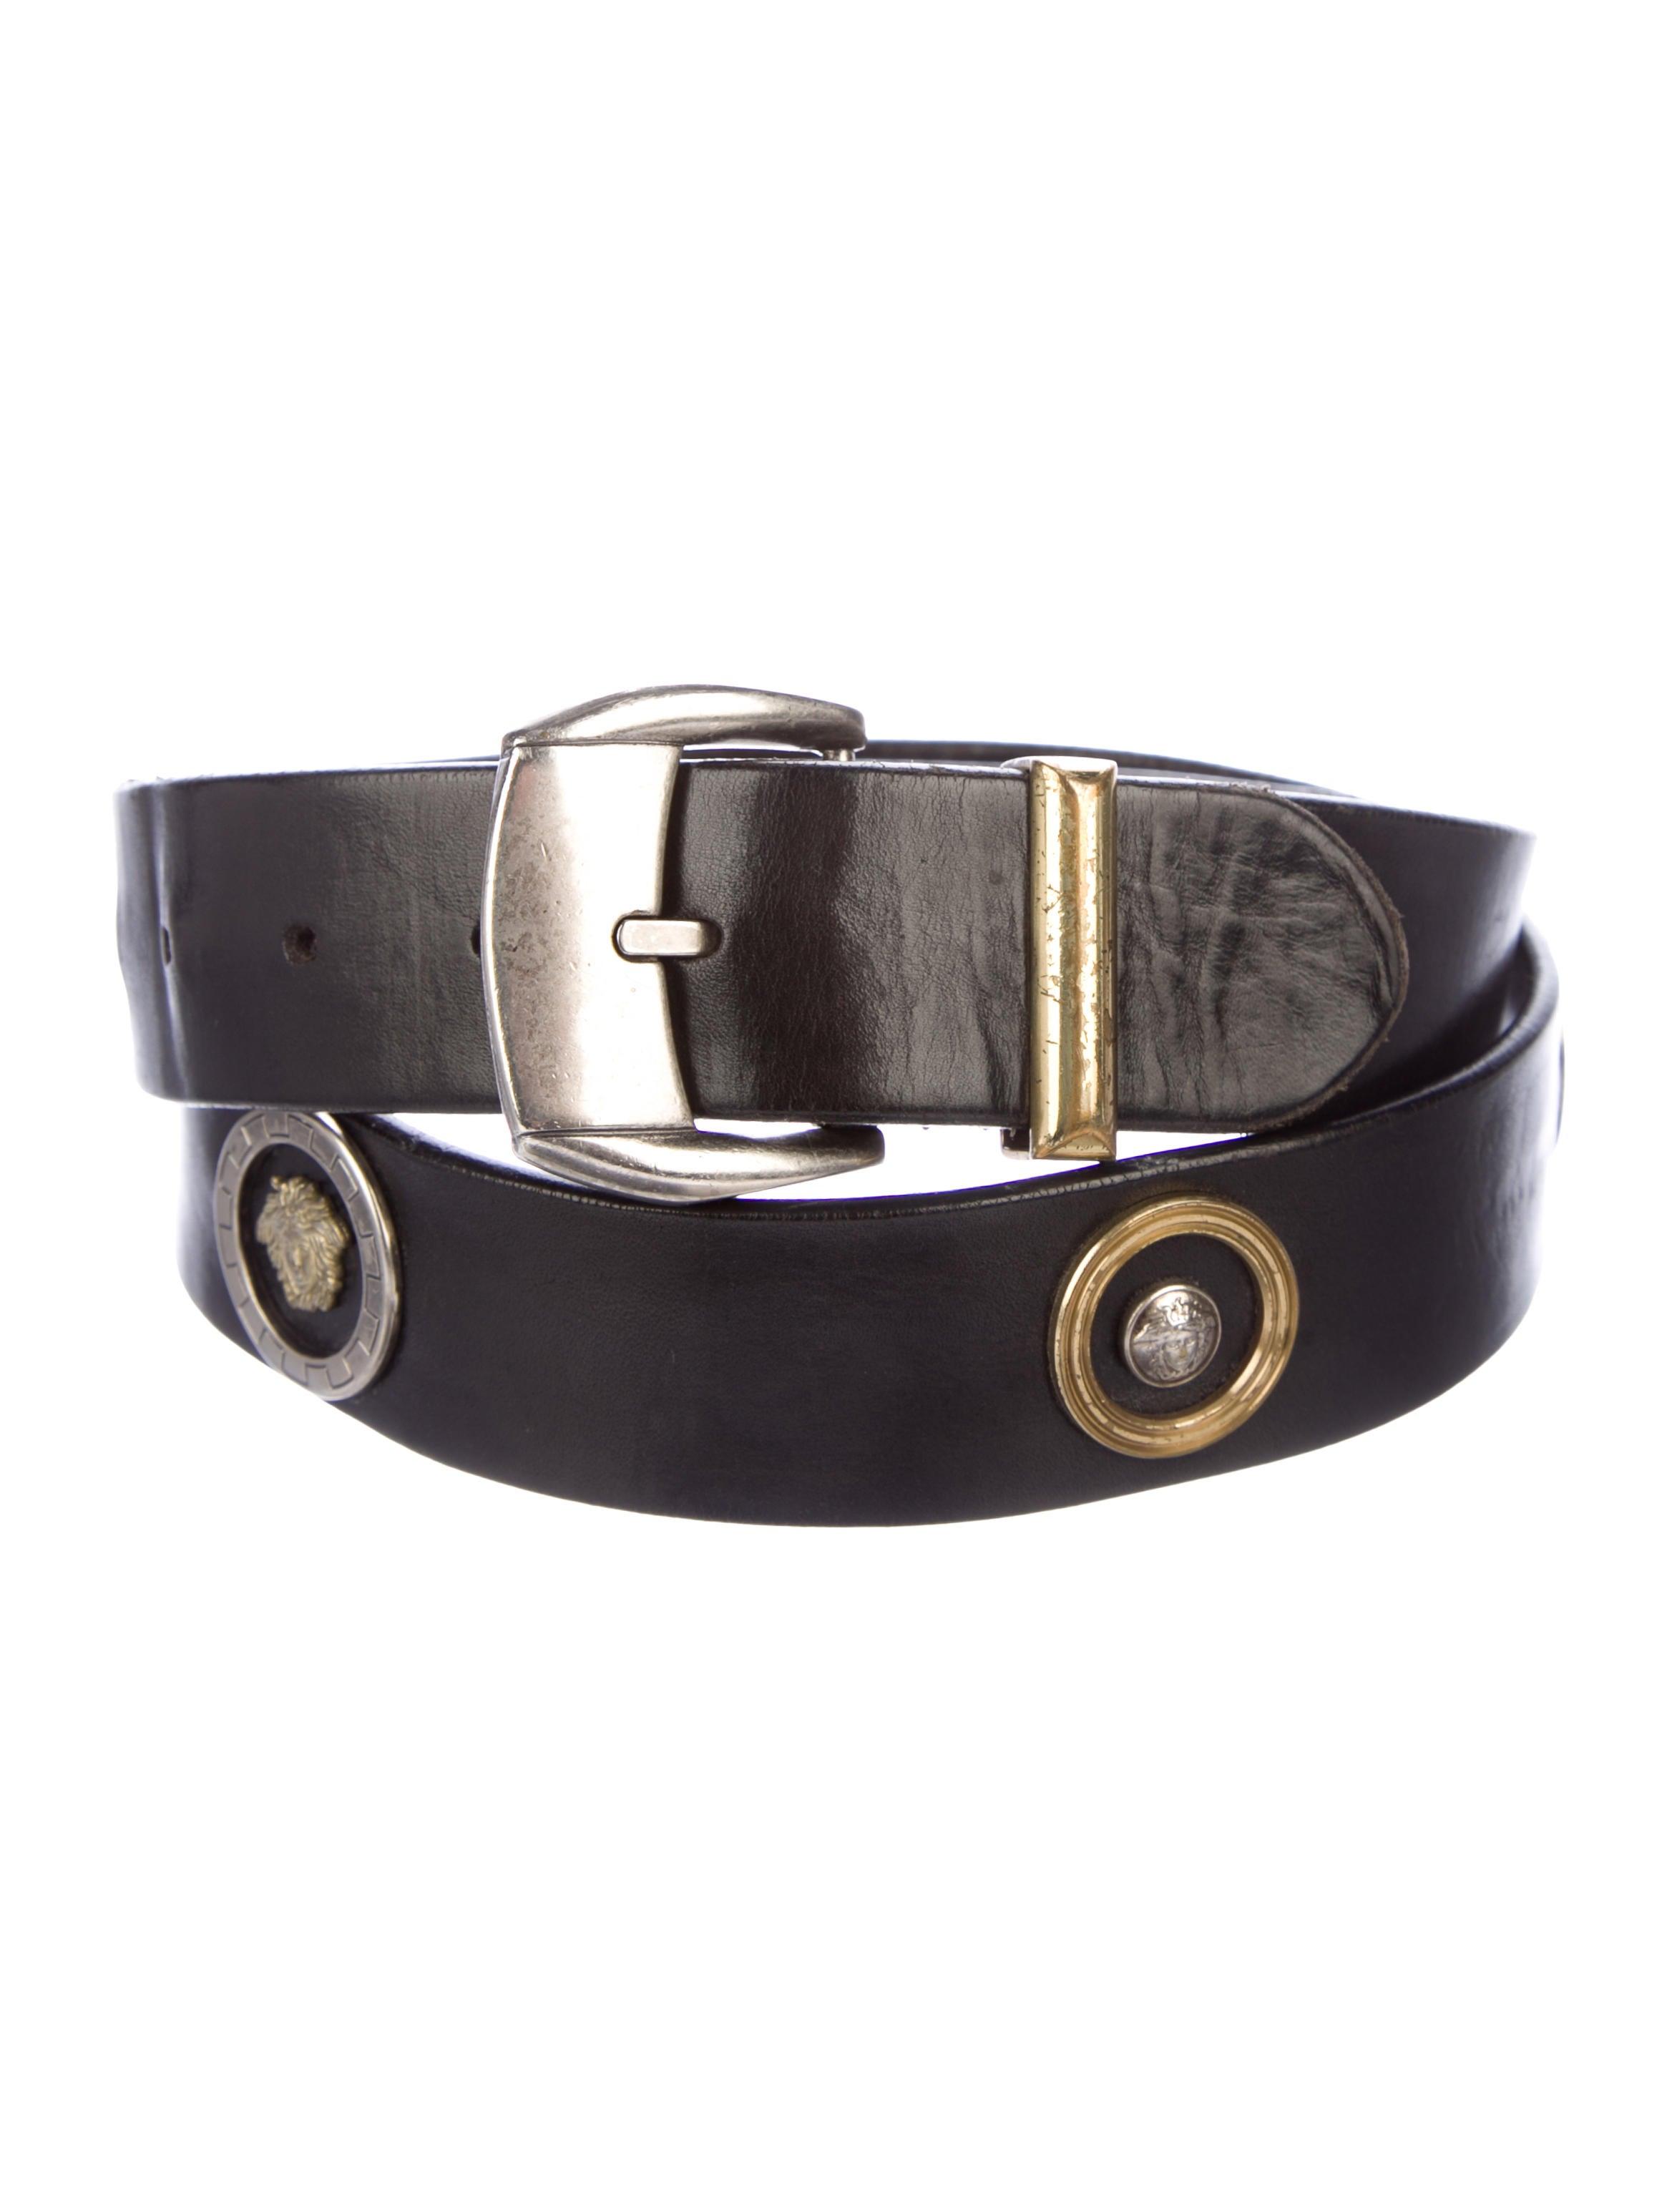 6d20fdbf7779 Versace Leather Buckle Belt - Accessories - VES41229